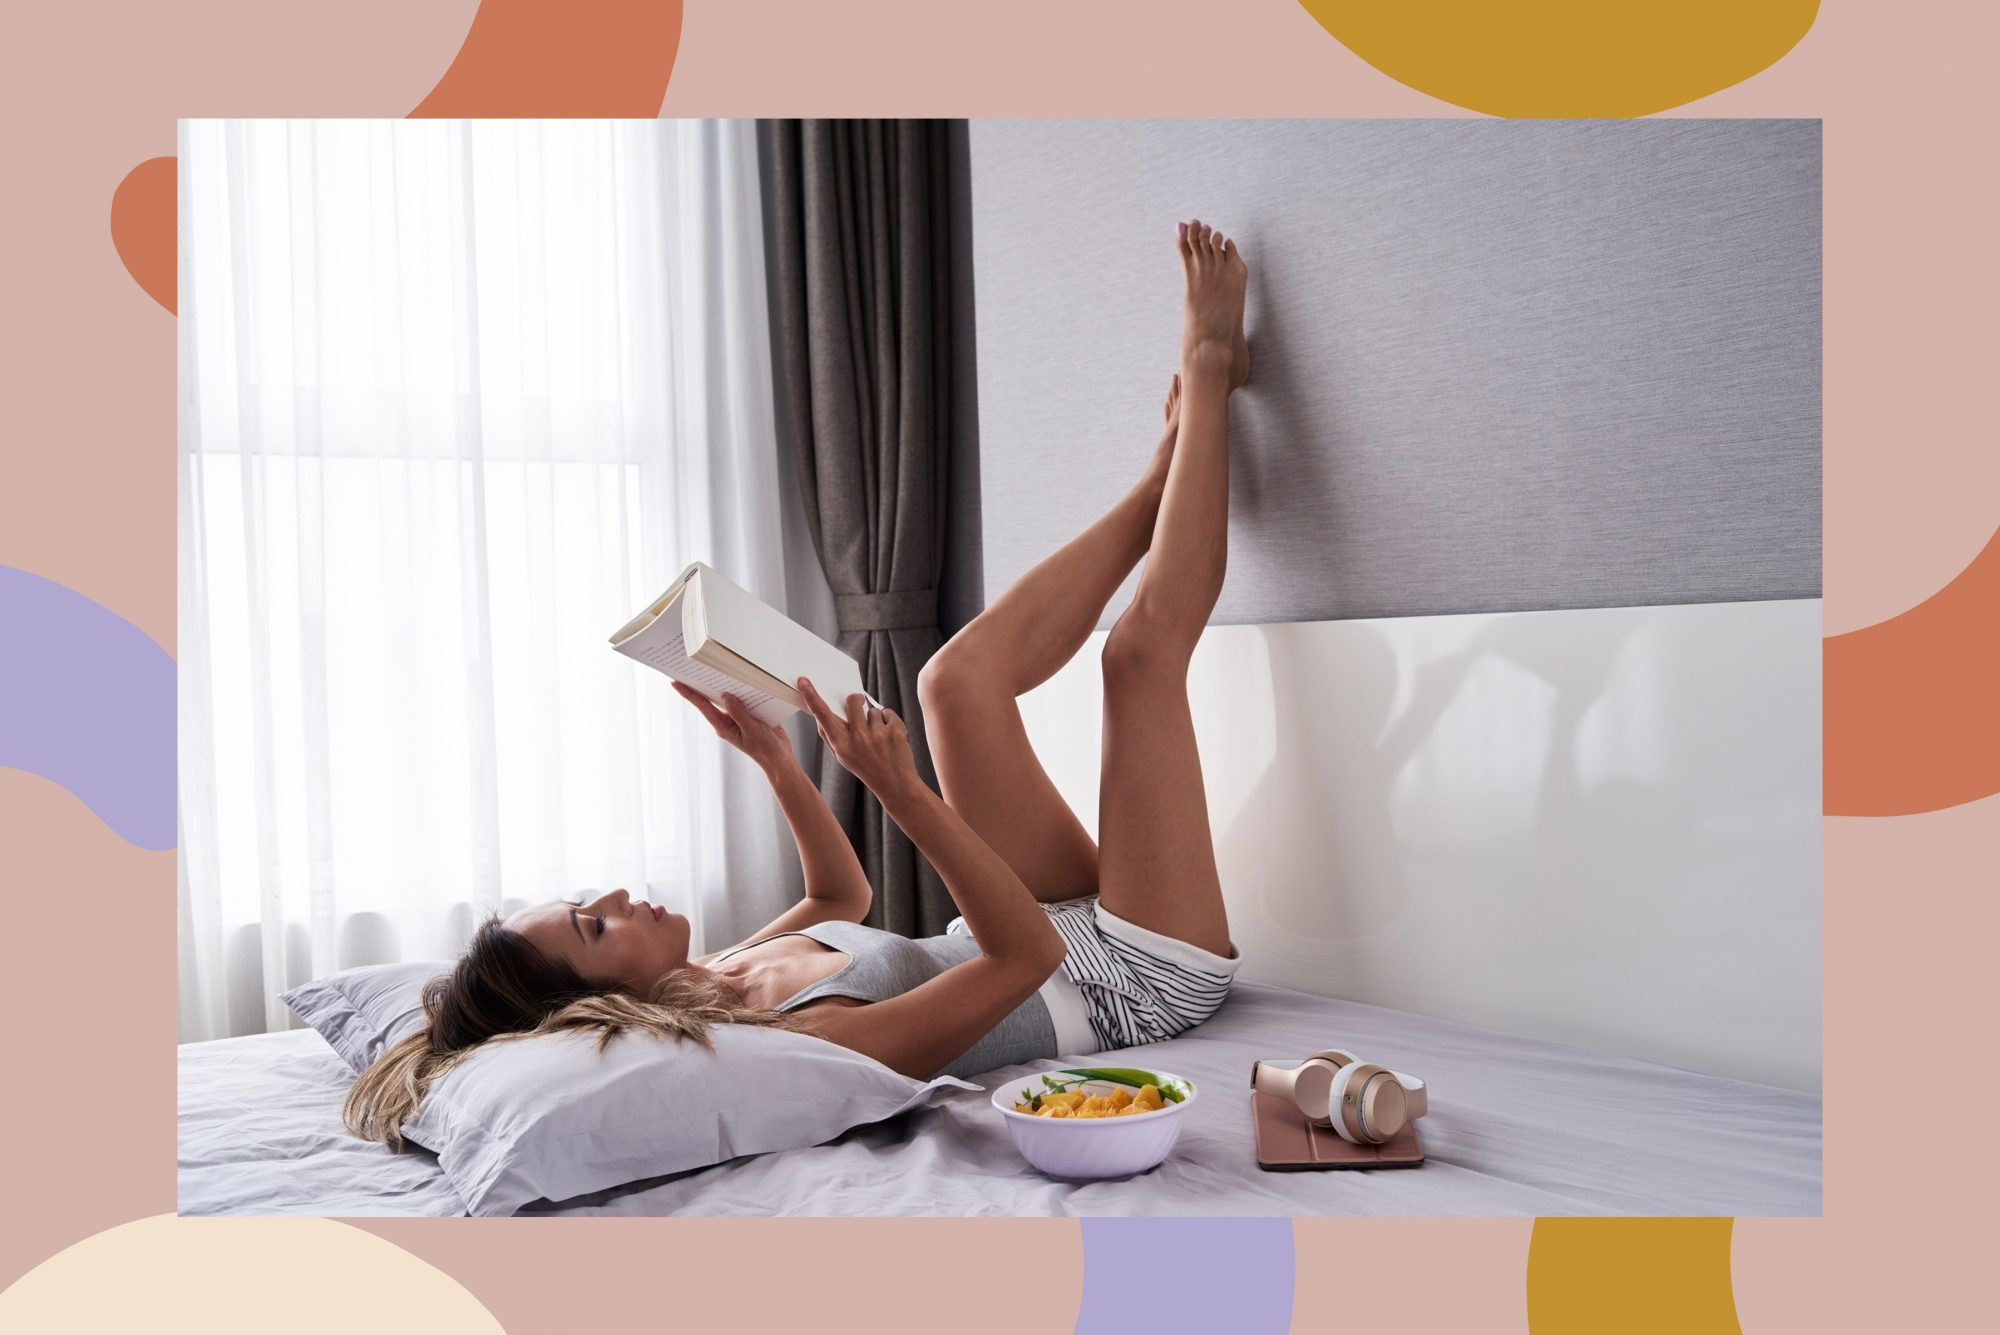 erotica benefits